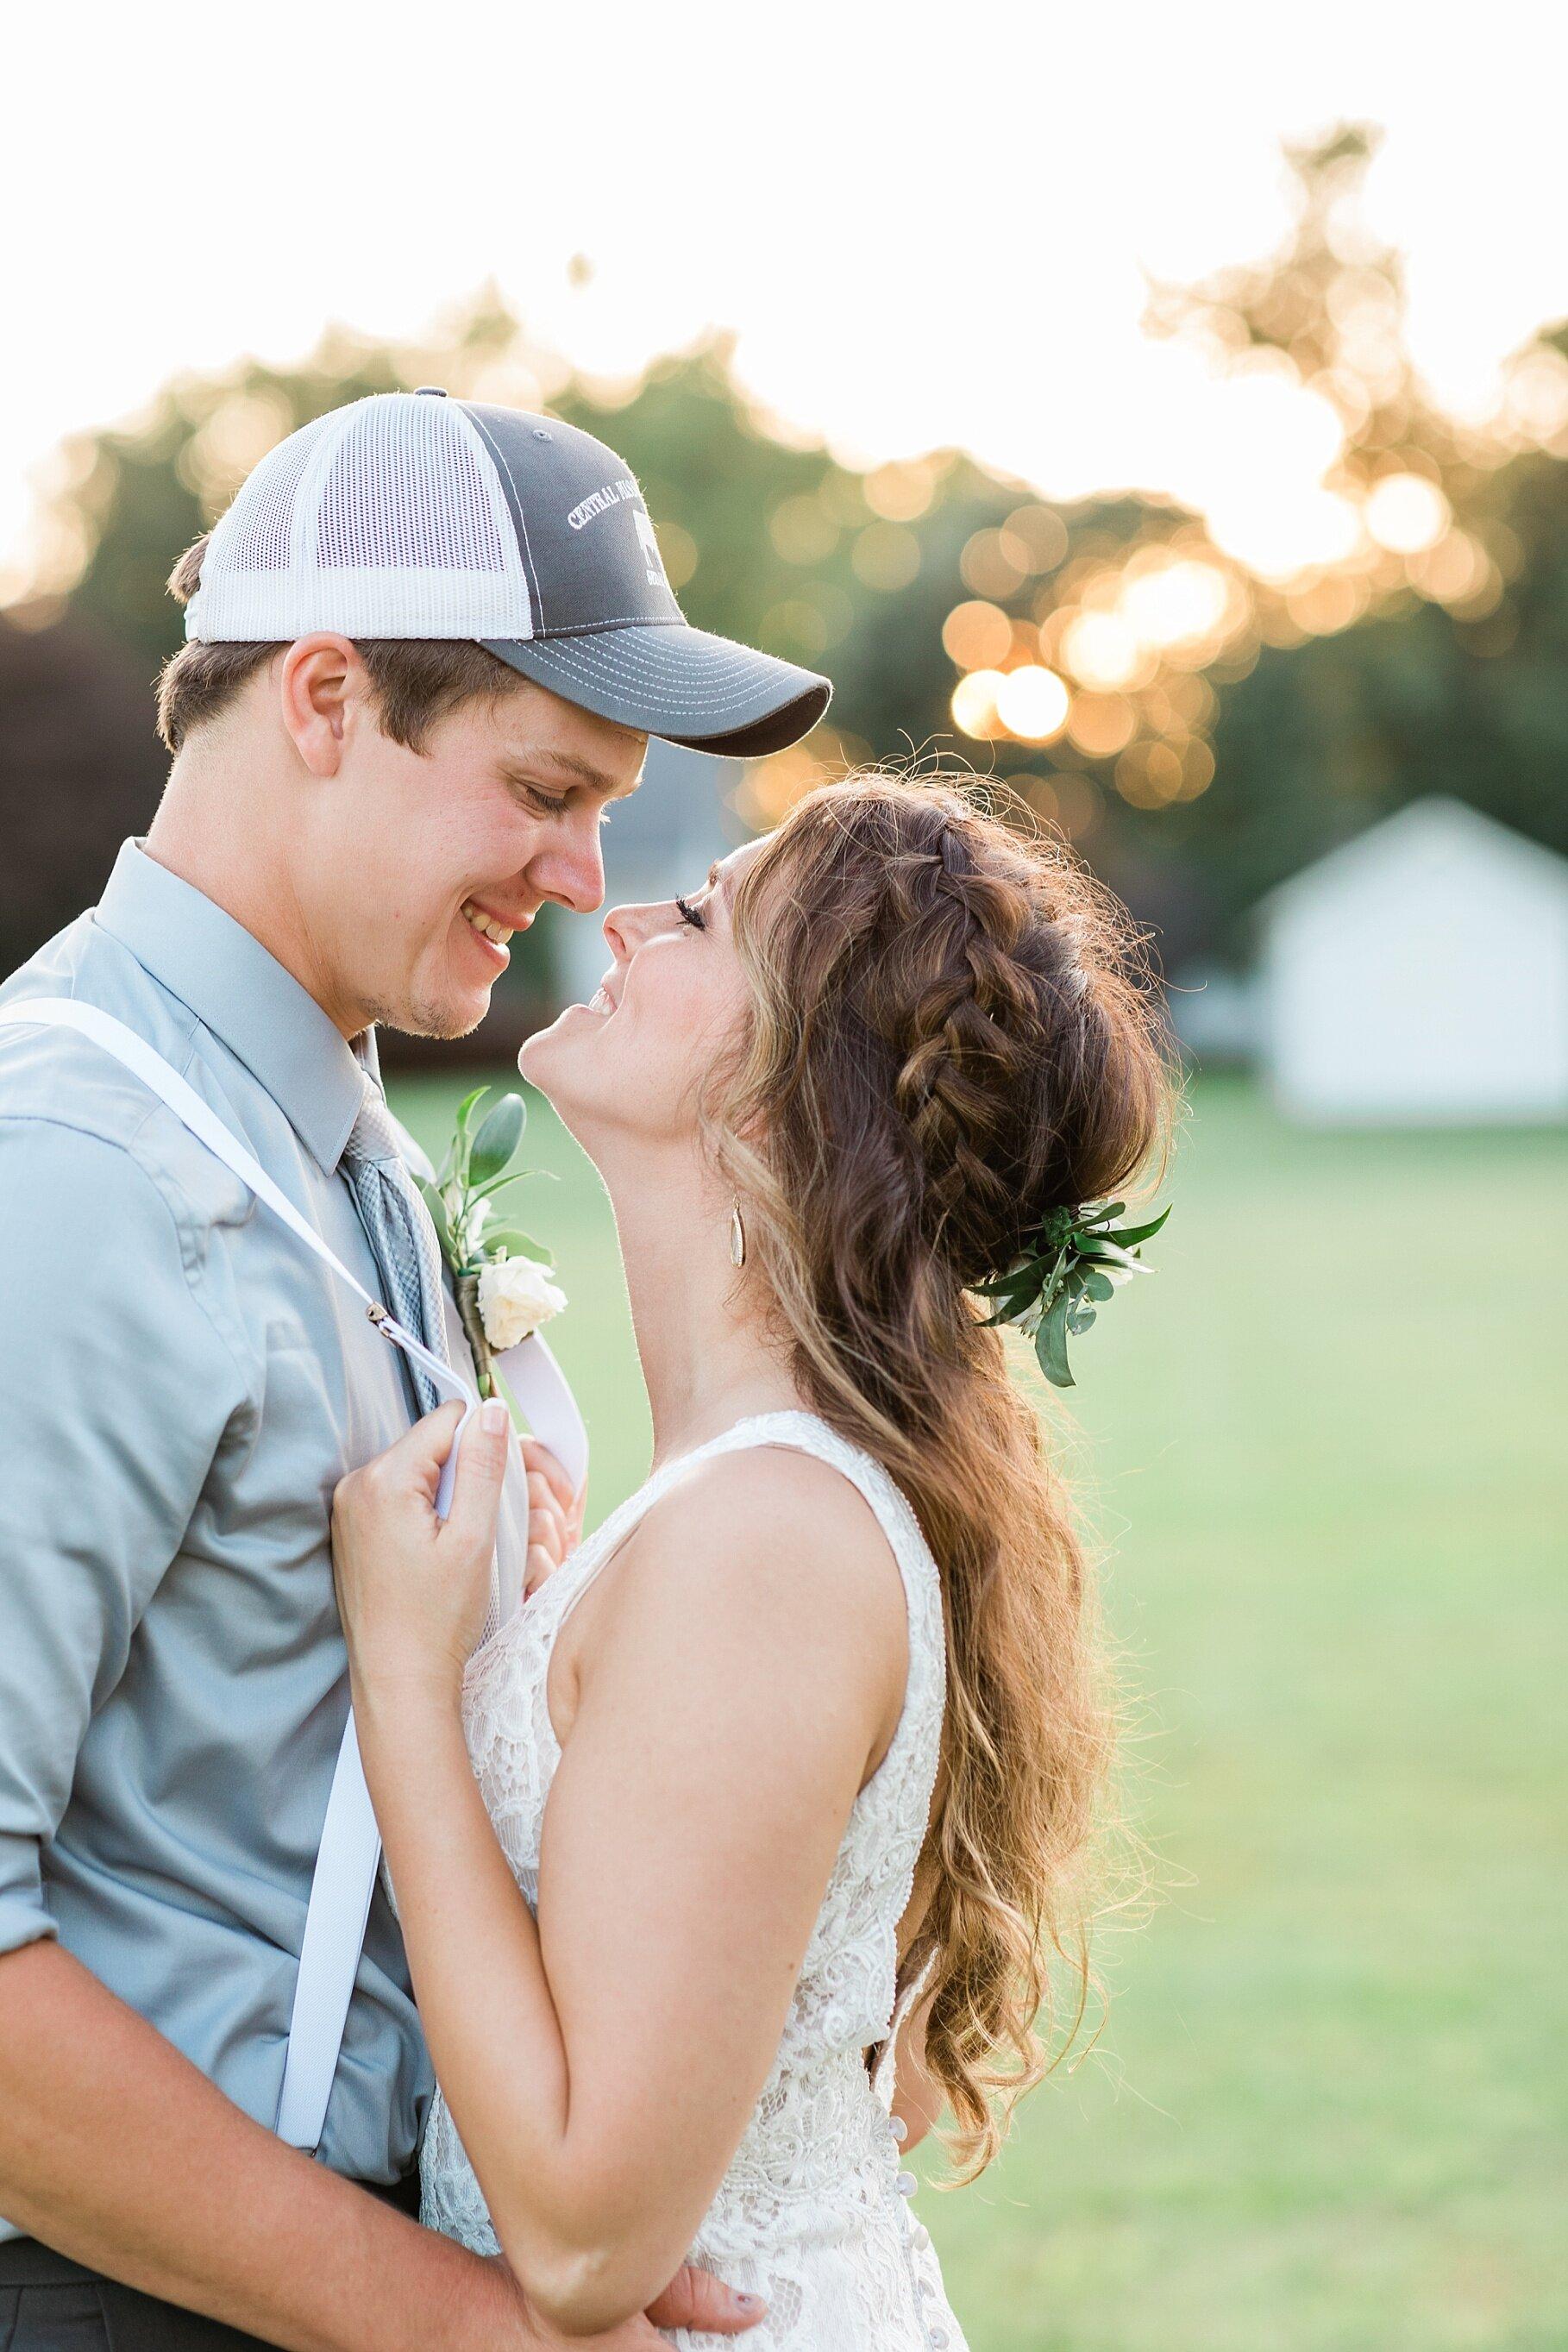 Earth-Toned Wedding by KKP Associate Wedding Photographer and Kelsi Kliethermes Photography Best Columbia Missouri Wedding Photographer_0041.jpg